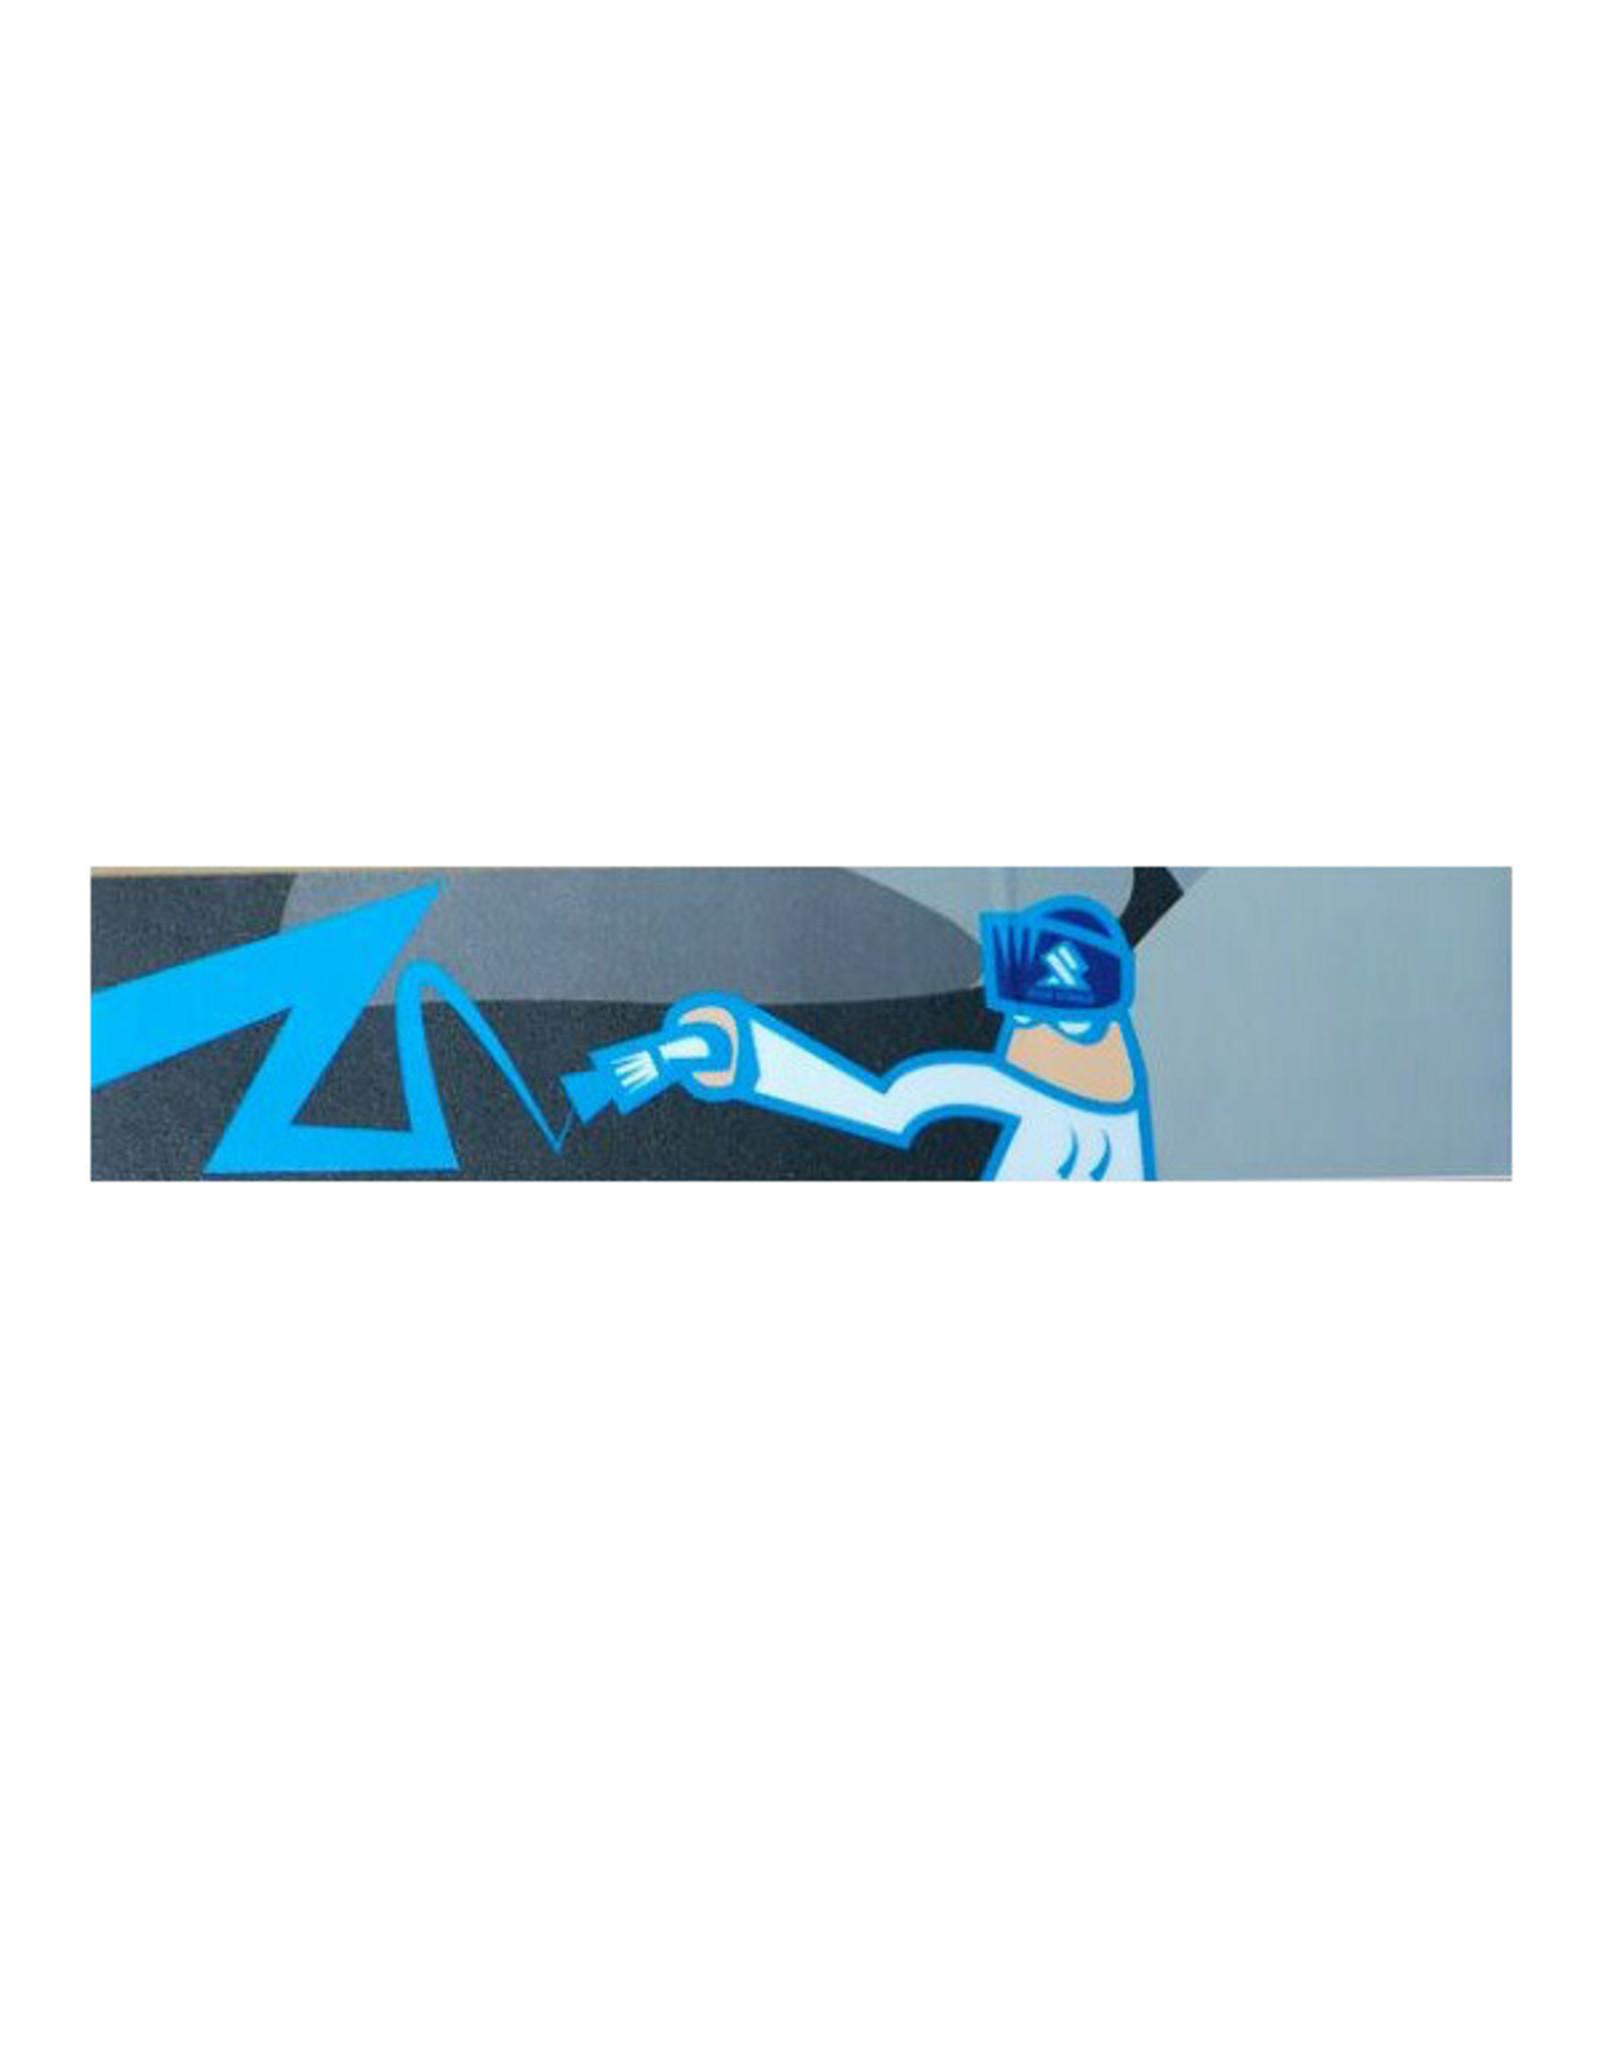 Blue Man Scooter Grip Tape